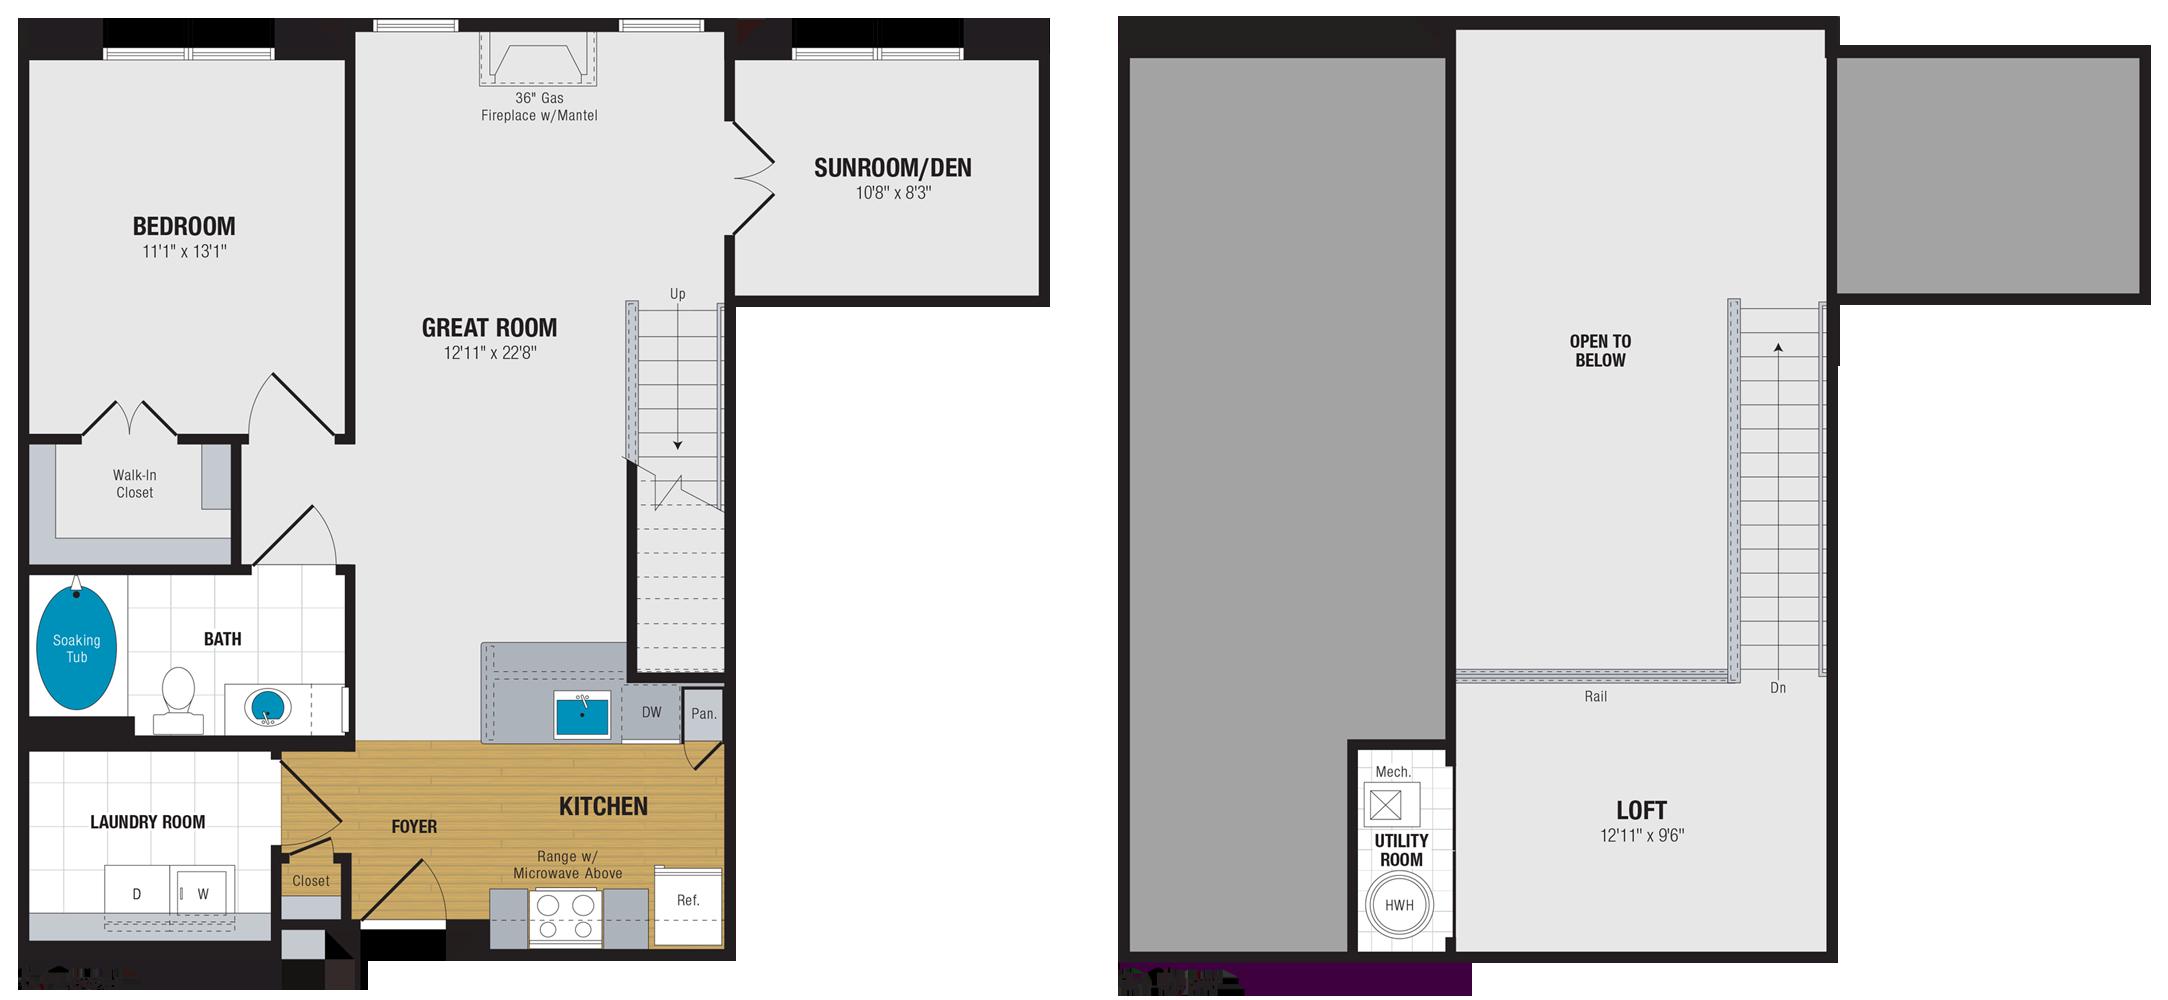 Md abingdon theenclaveatboxhill p0663789 34570722196459 2 floorplan